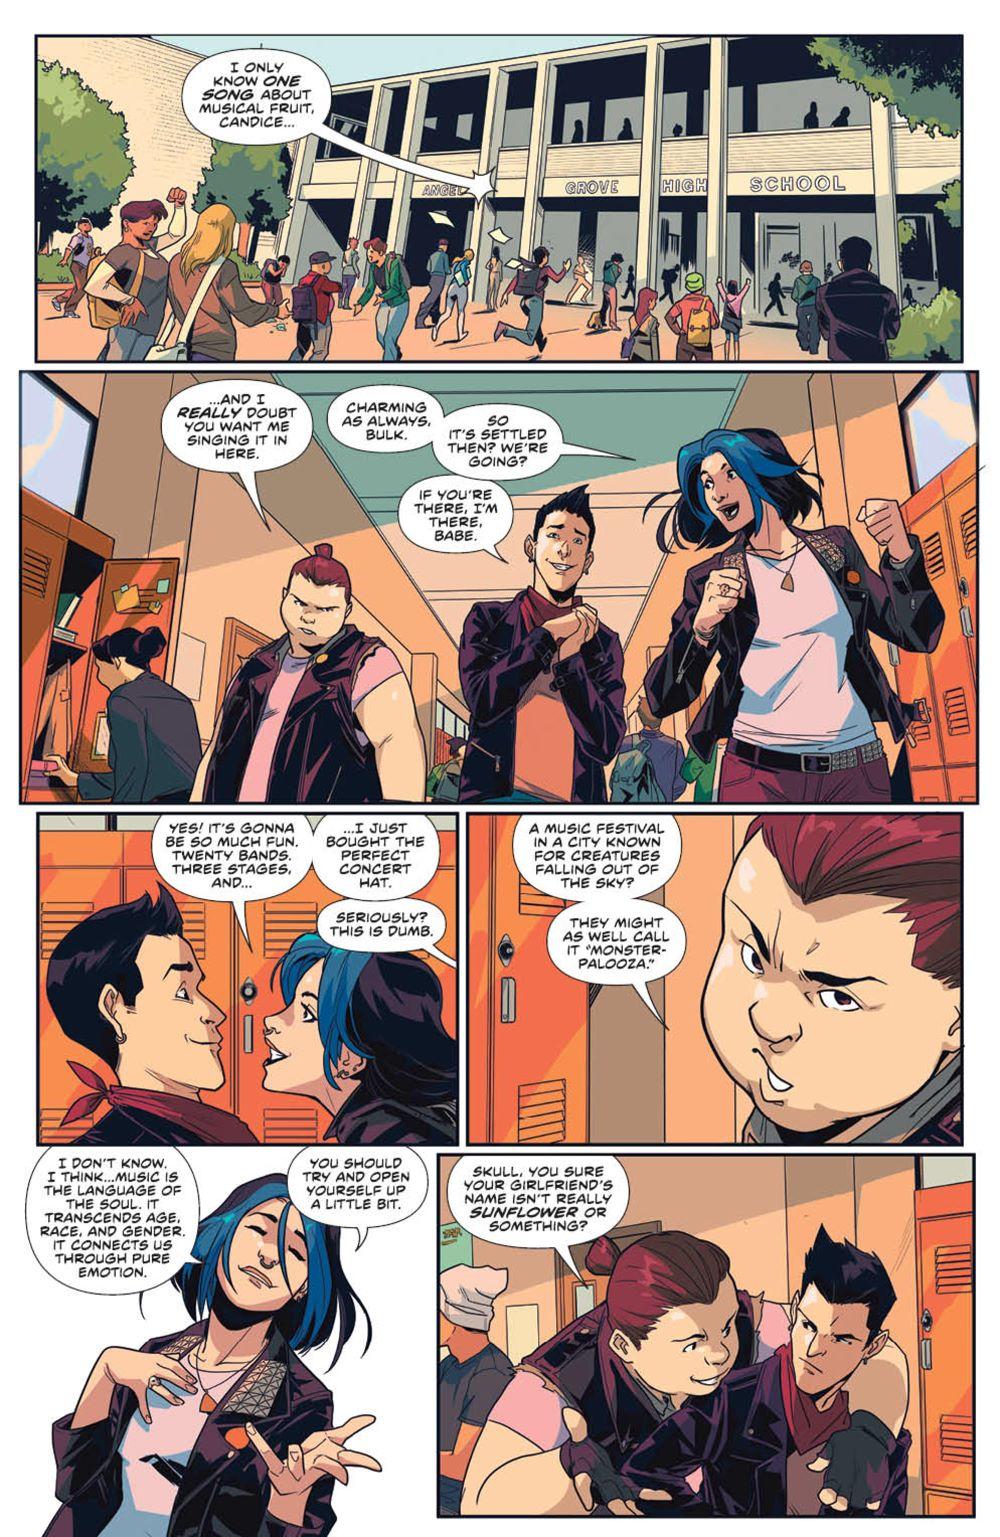 MightyMorphin_v1_SC_PRESS_19 ComicList Previews: MIGHTY MORPHIN VOLUME 1 TP